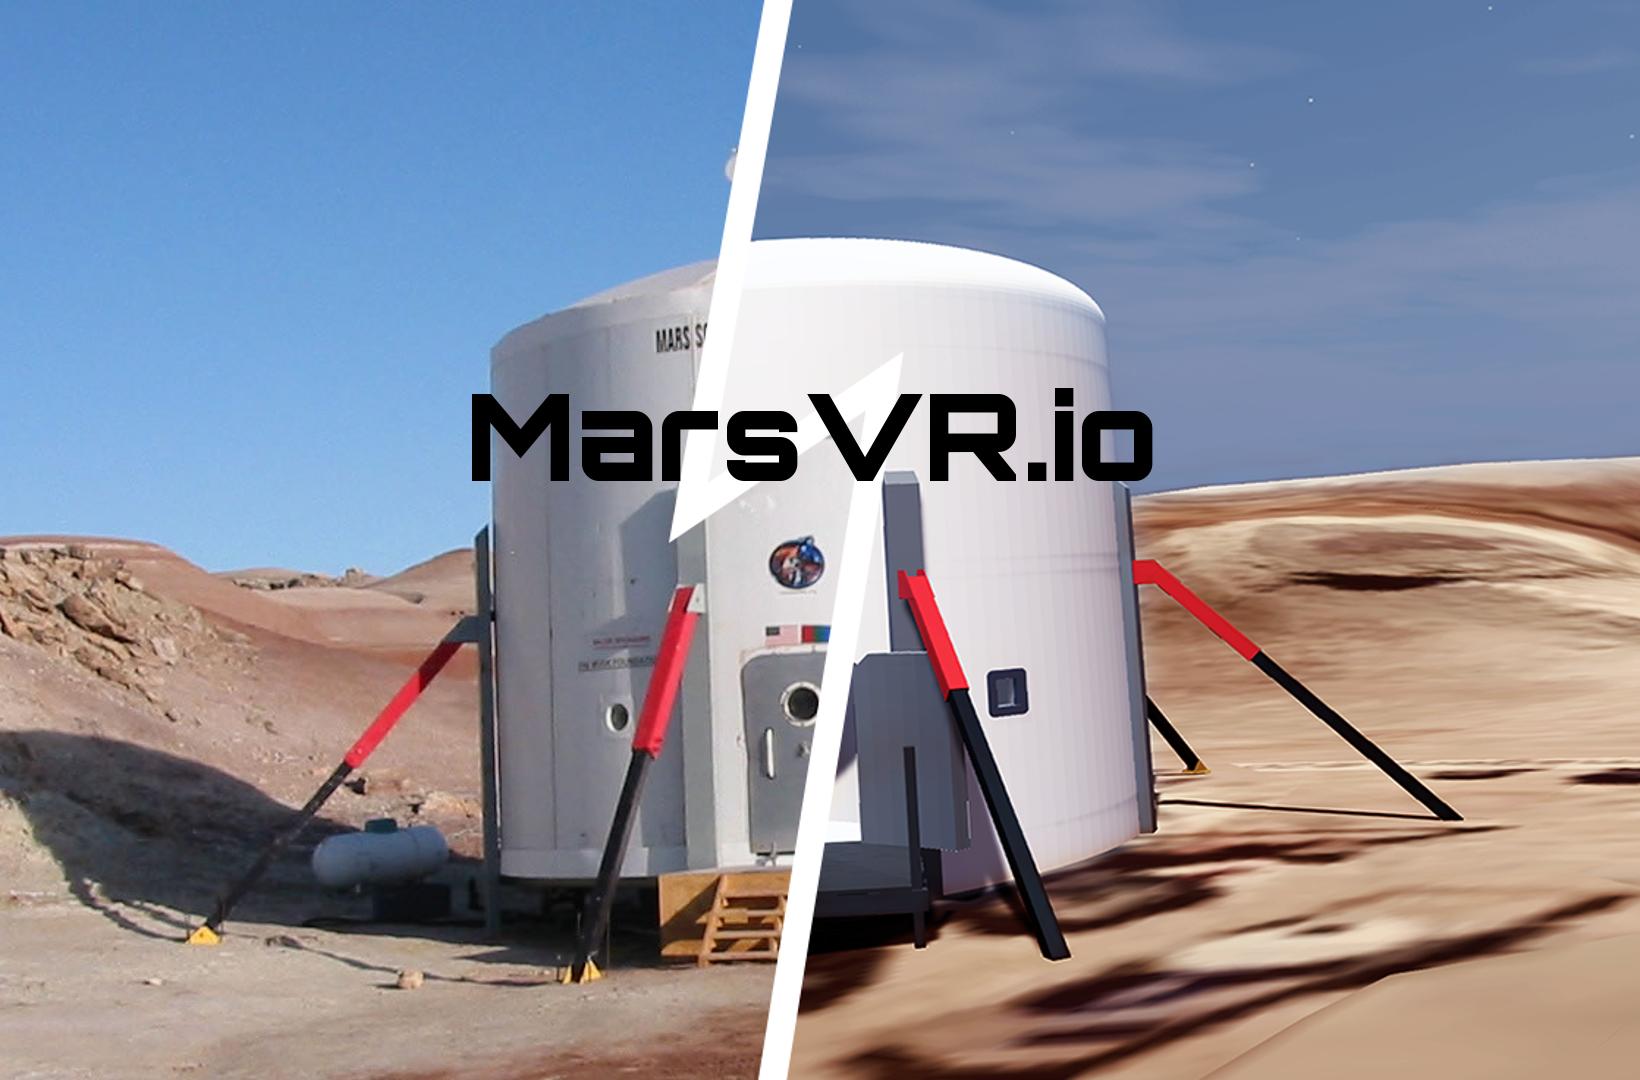 Mars Society Launches Kickstarter to Create MarsVR Crew Training Program